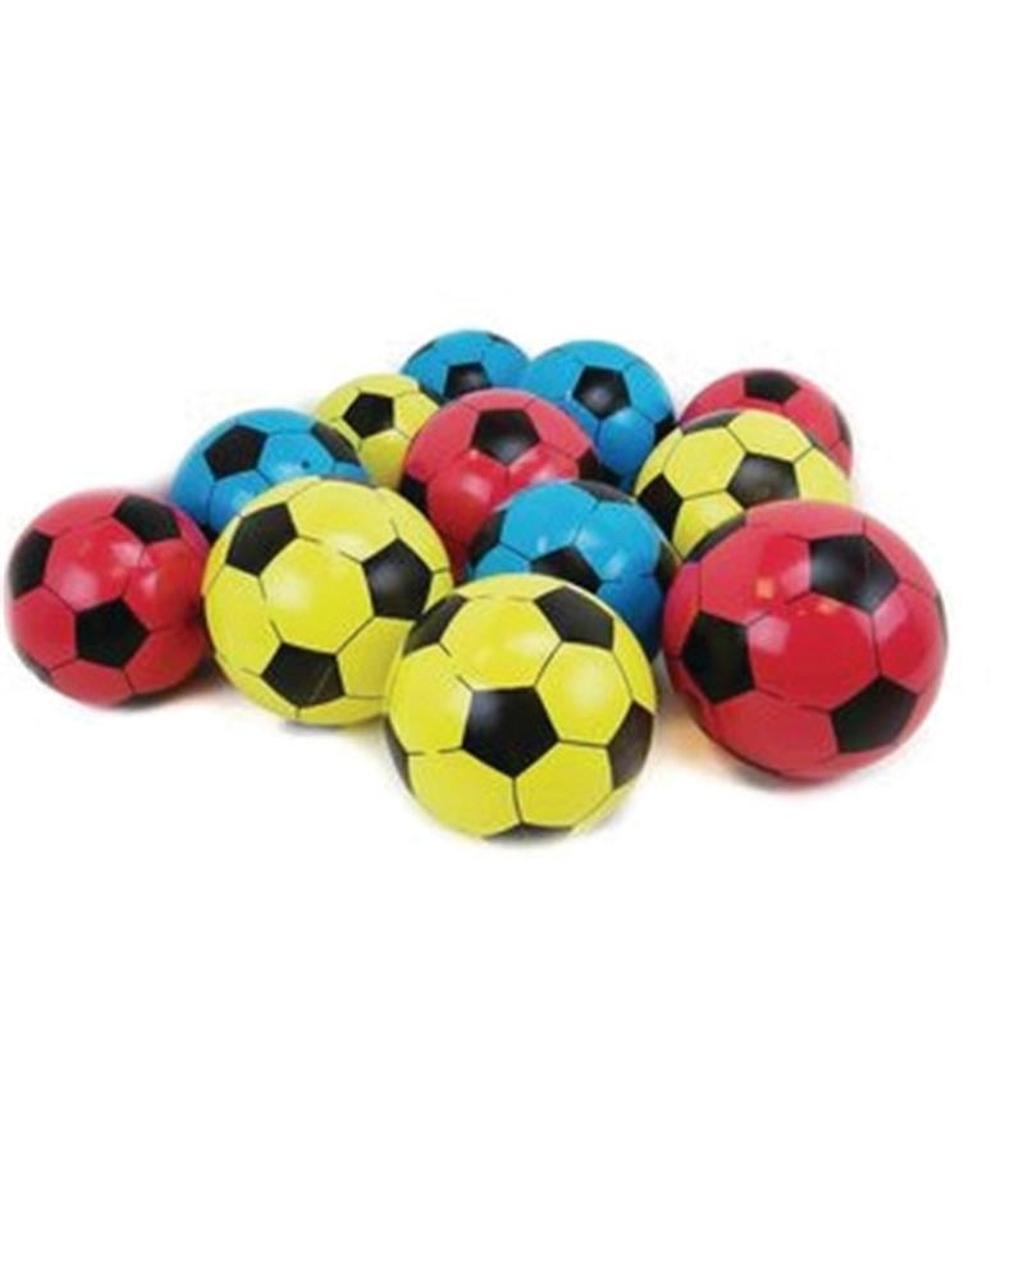 Soccer Play Balls